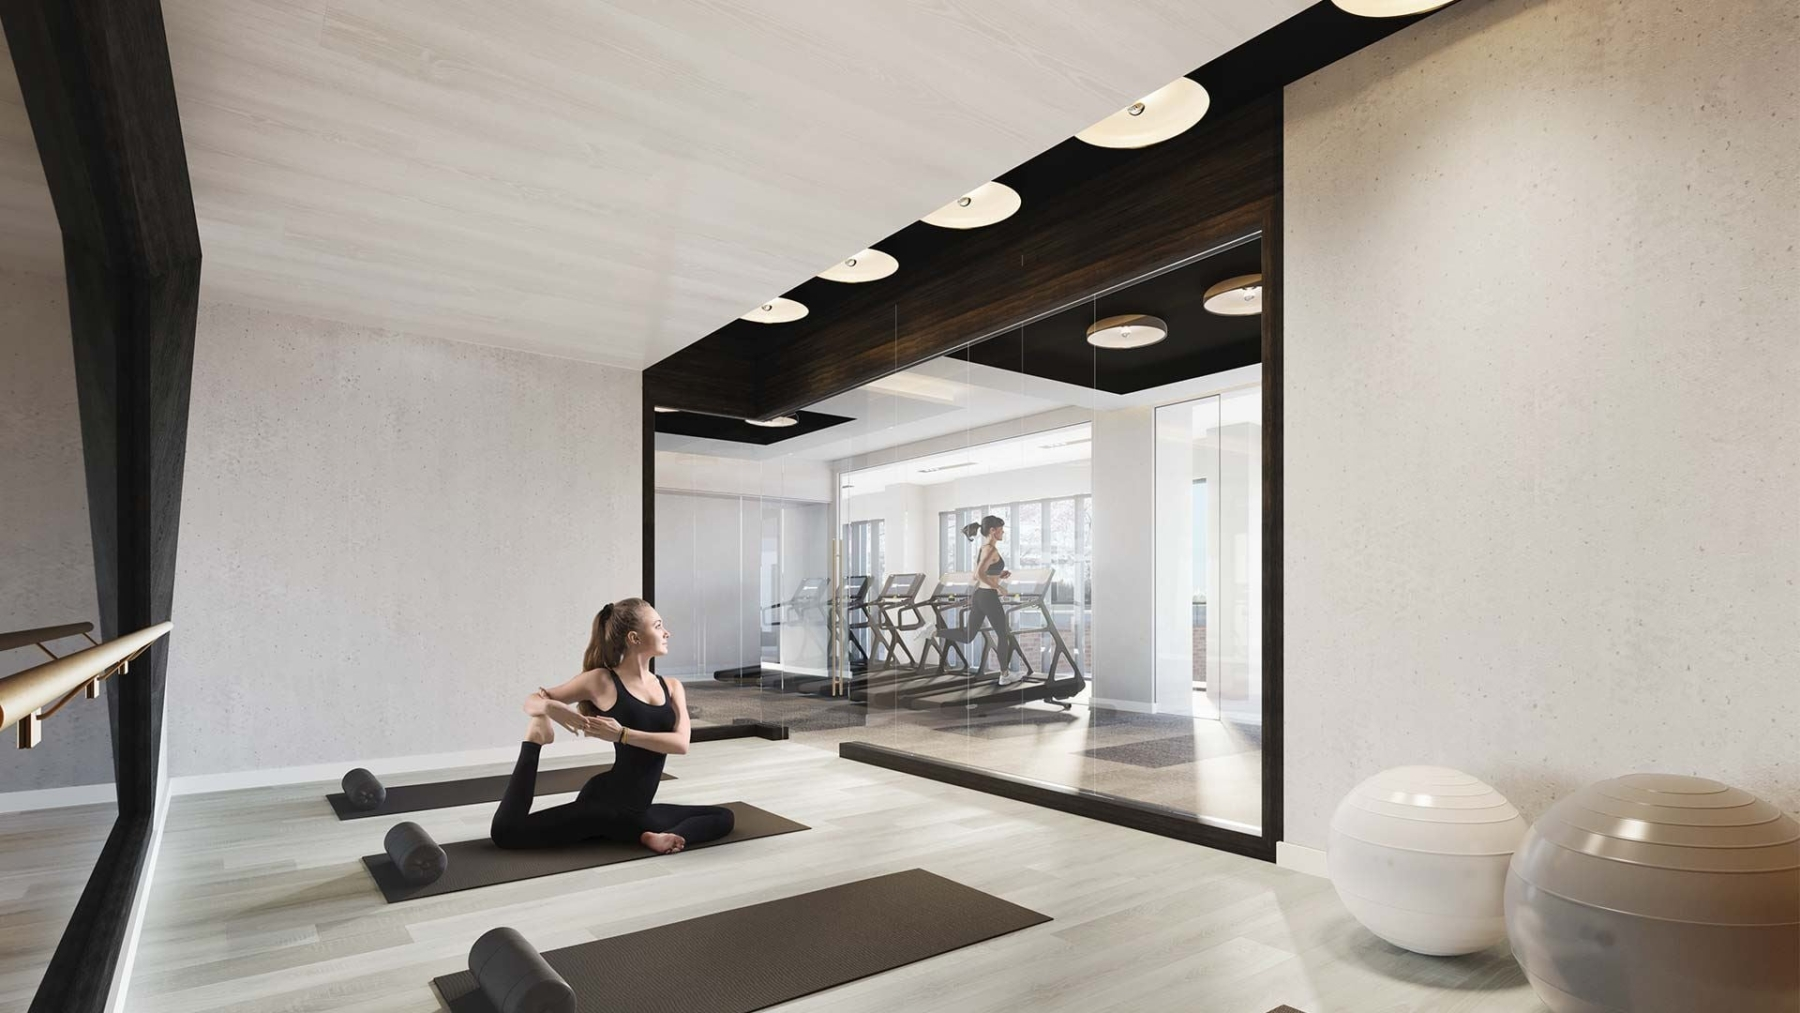 The Dupont Condos fitness studio for yoga